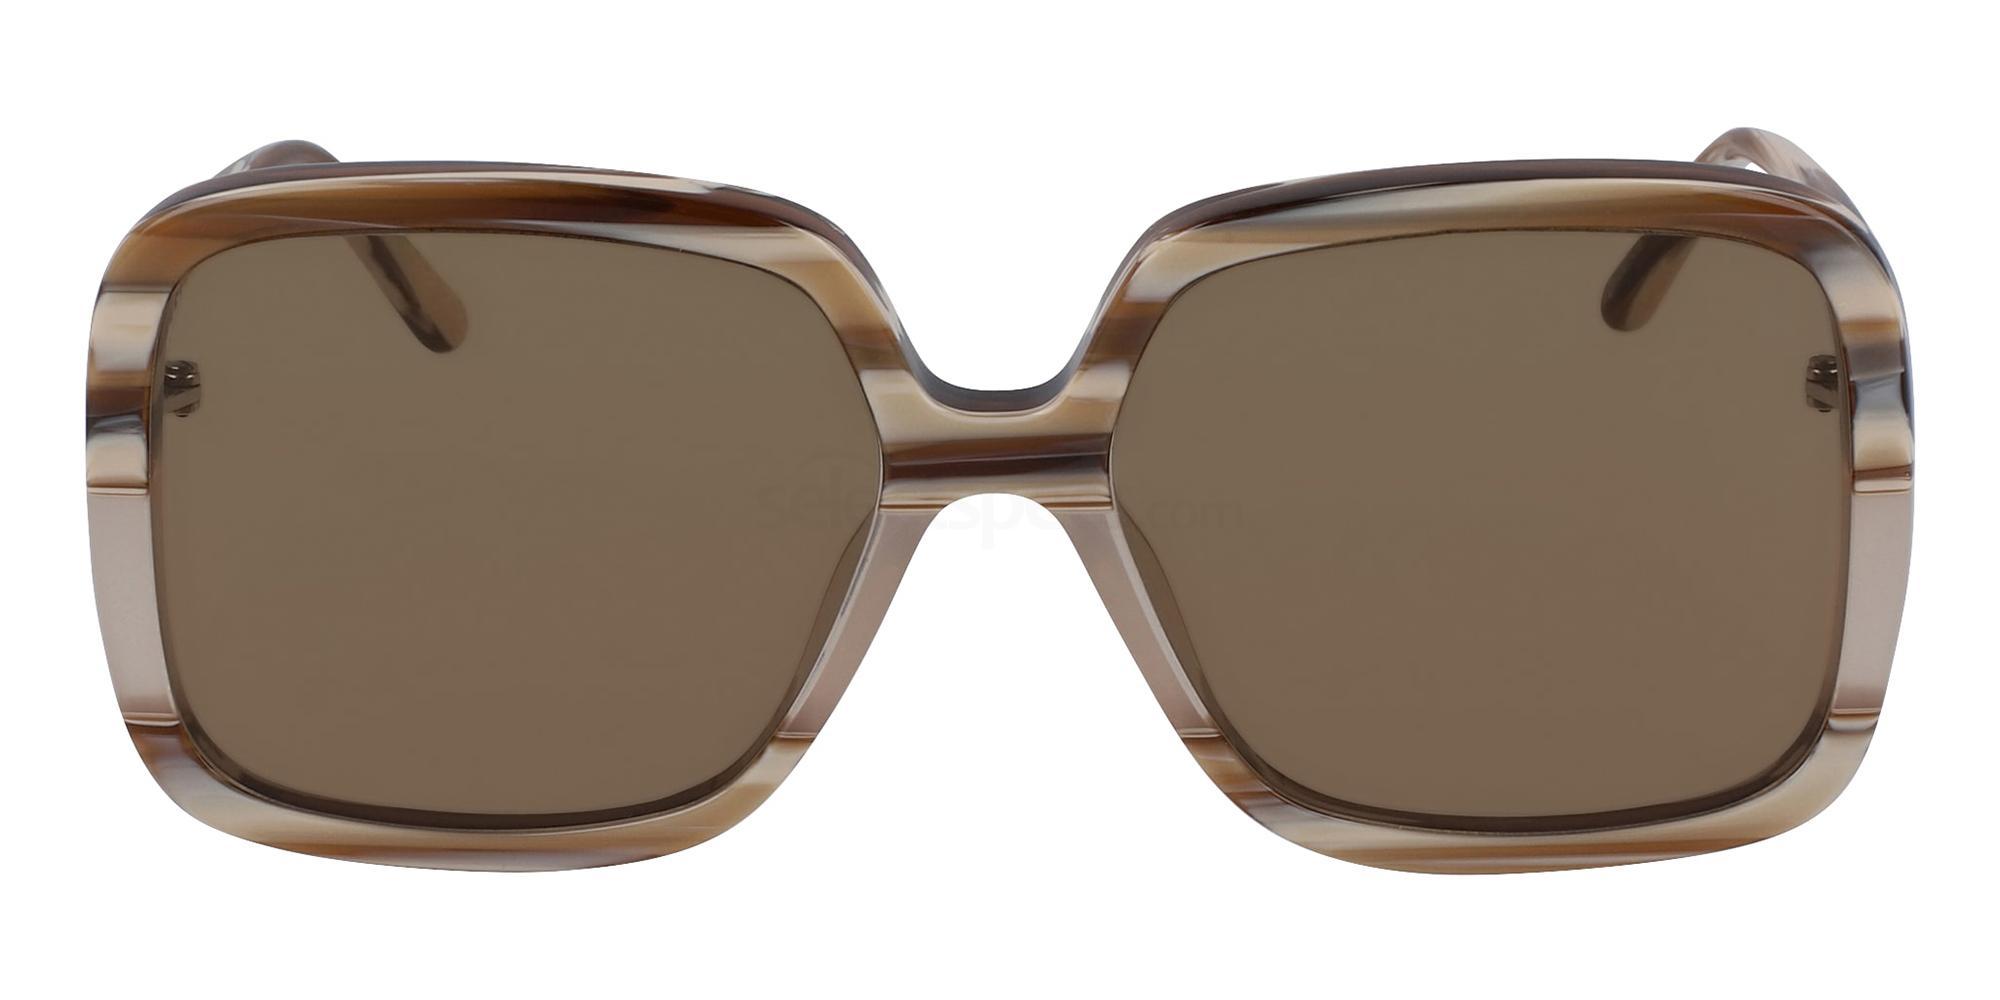 216 ME650S Sunglasses, Marni